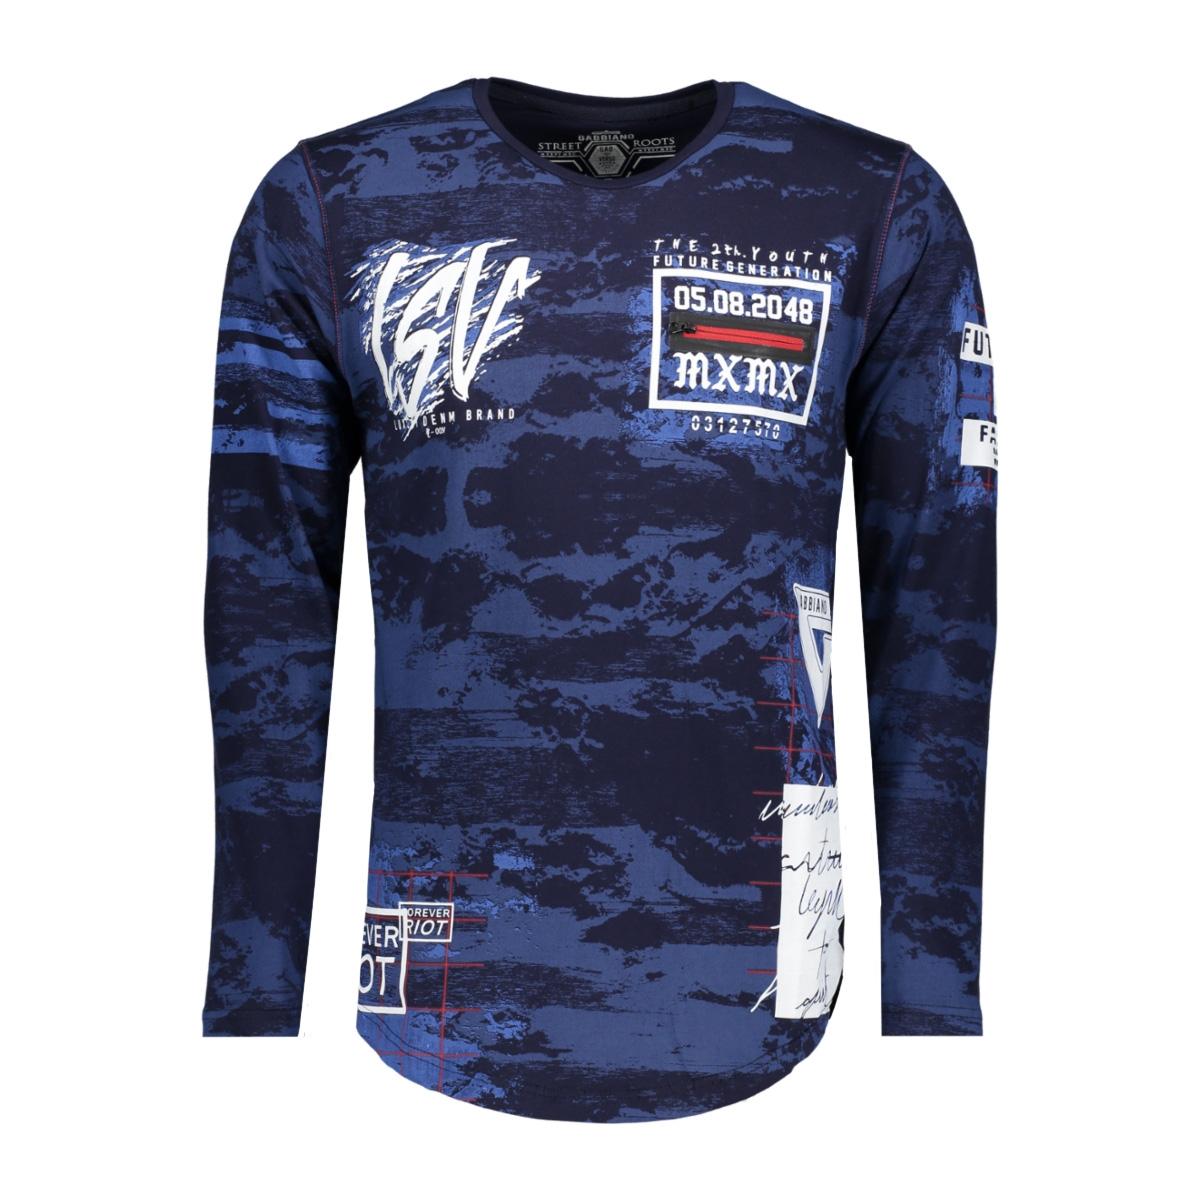 13849 gabbiano t-shirt navy